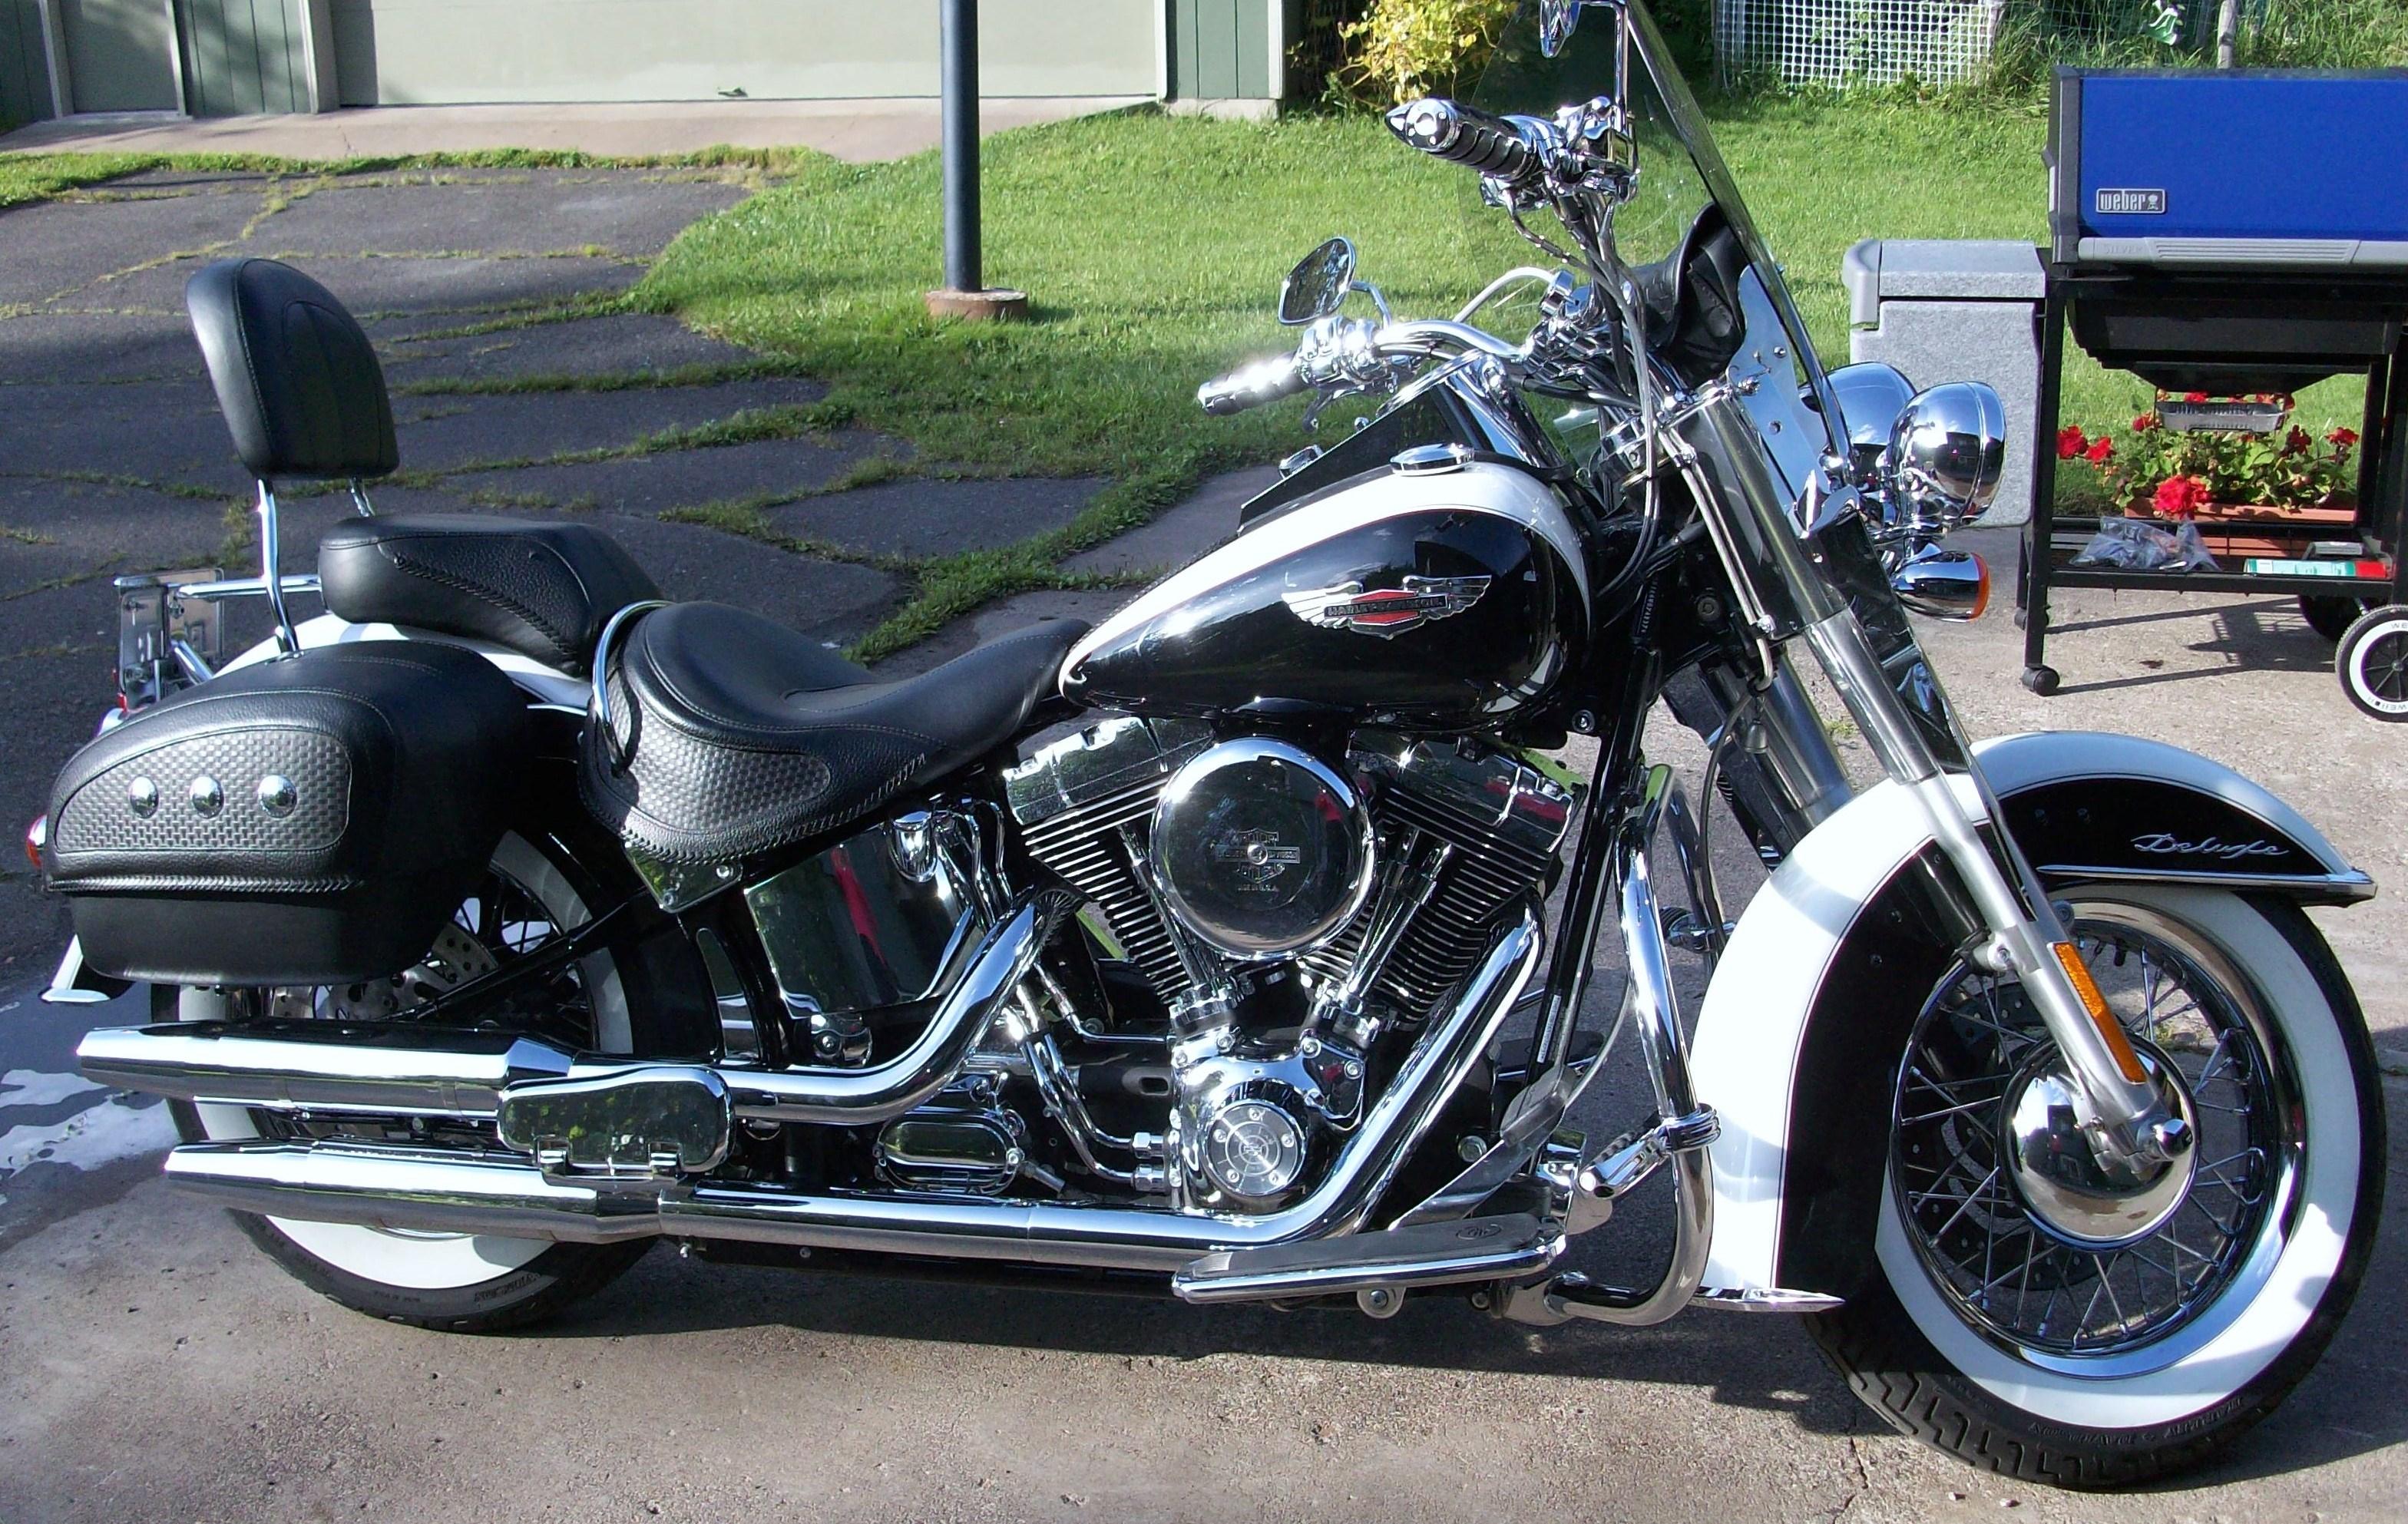 Harley Davidson Softail For Sale Minnesota >> 2005 Harley-Davidson® FLSTN/I Softail® Deluxe (Pearl White Vivid Black), Duluth, Minnesota ...